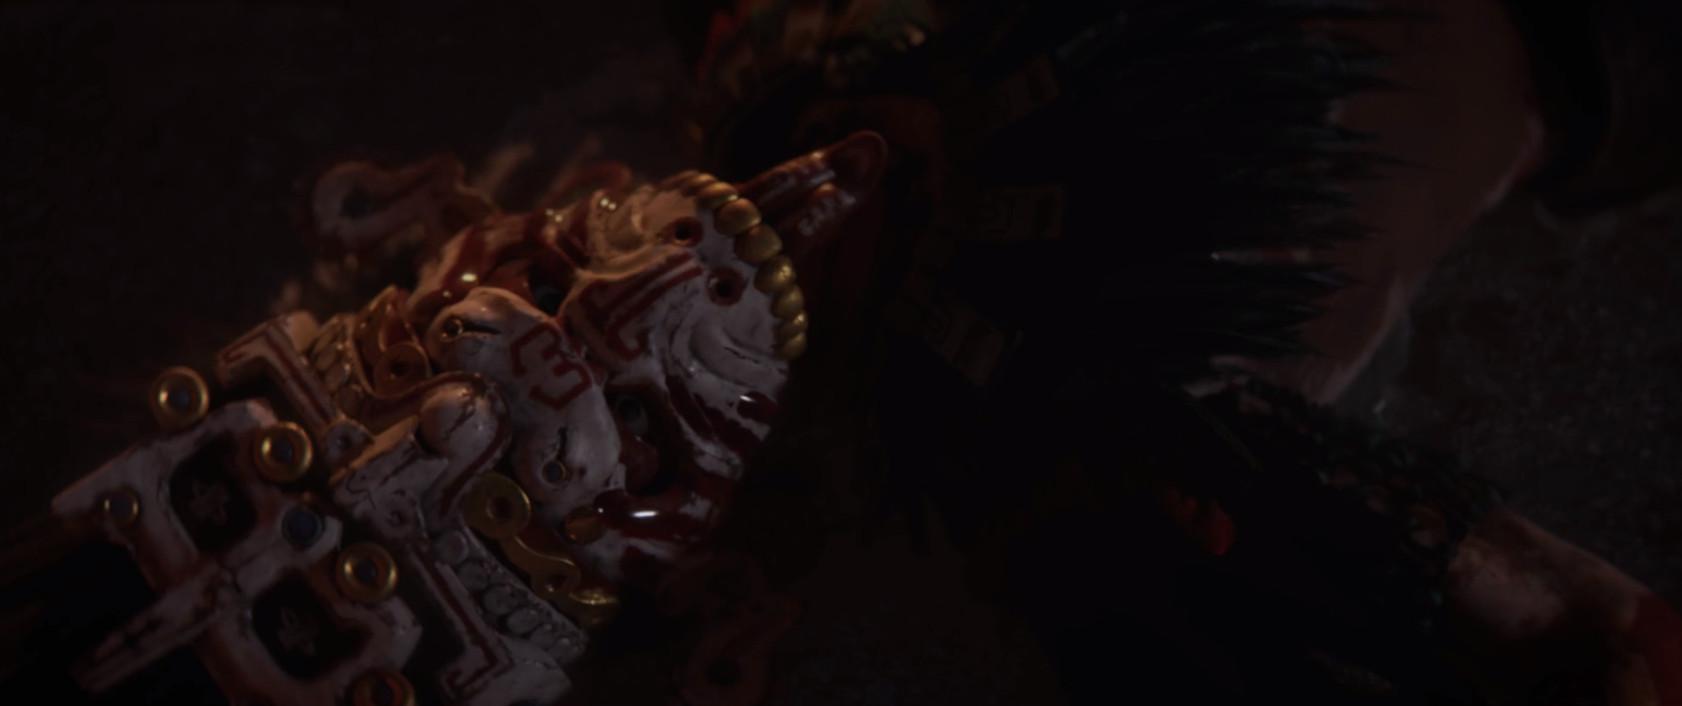 shadow-tomb-raider-end-of-beginning-trailer50